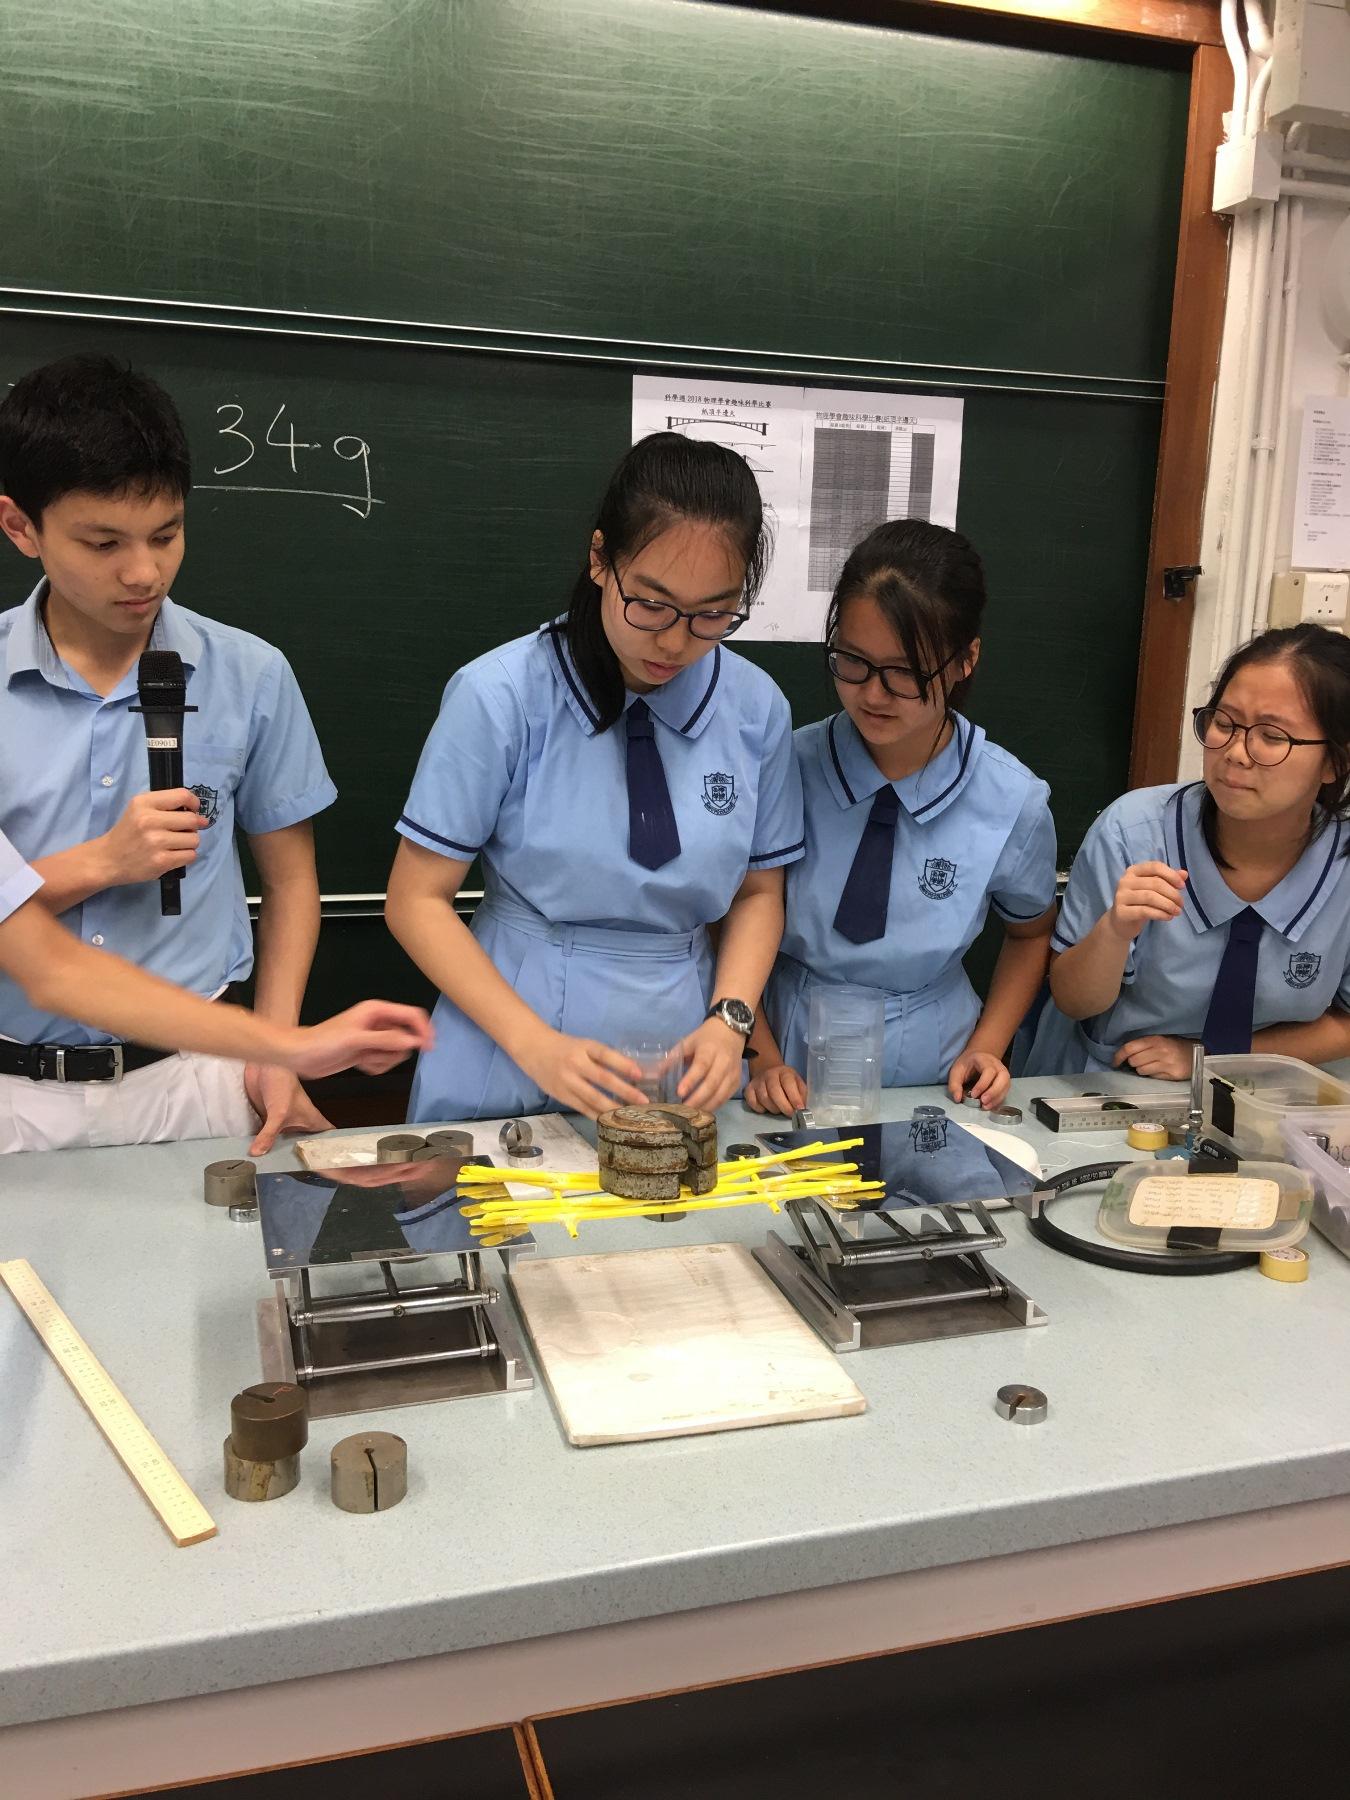 http://npc.edu.hk/sites/default/files/img_6421.jpg